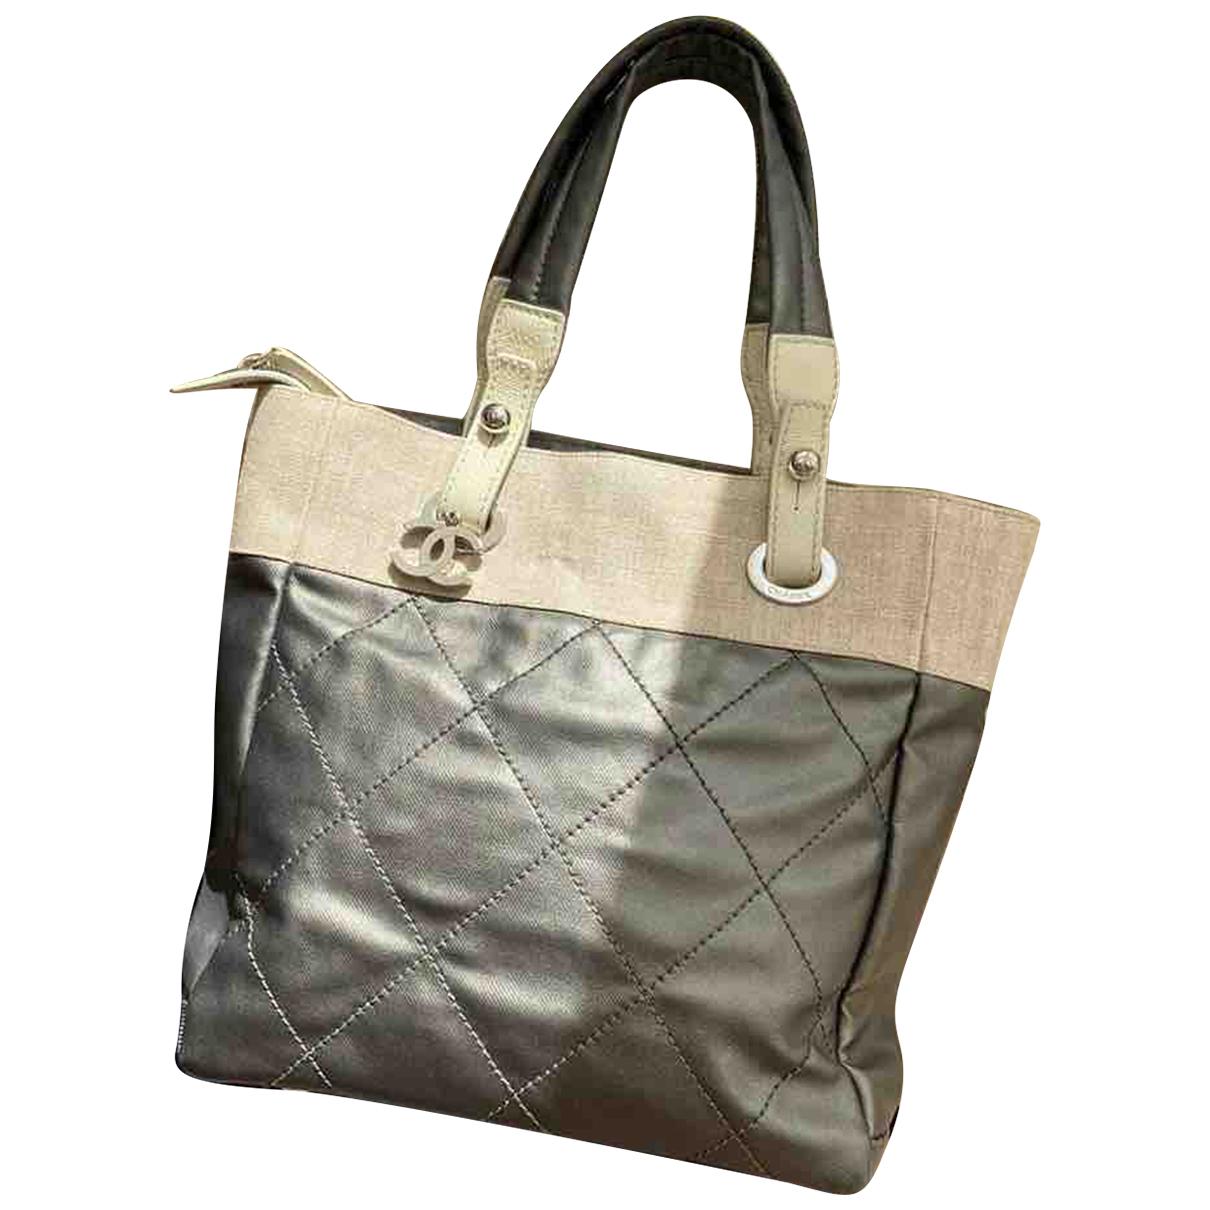 Chanel Petite Shopping Tote Handtasche in  Grau Leinen